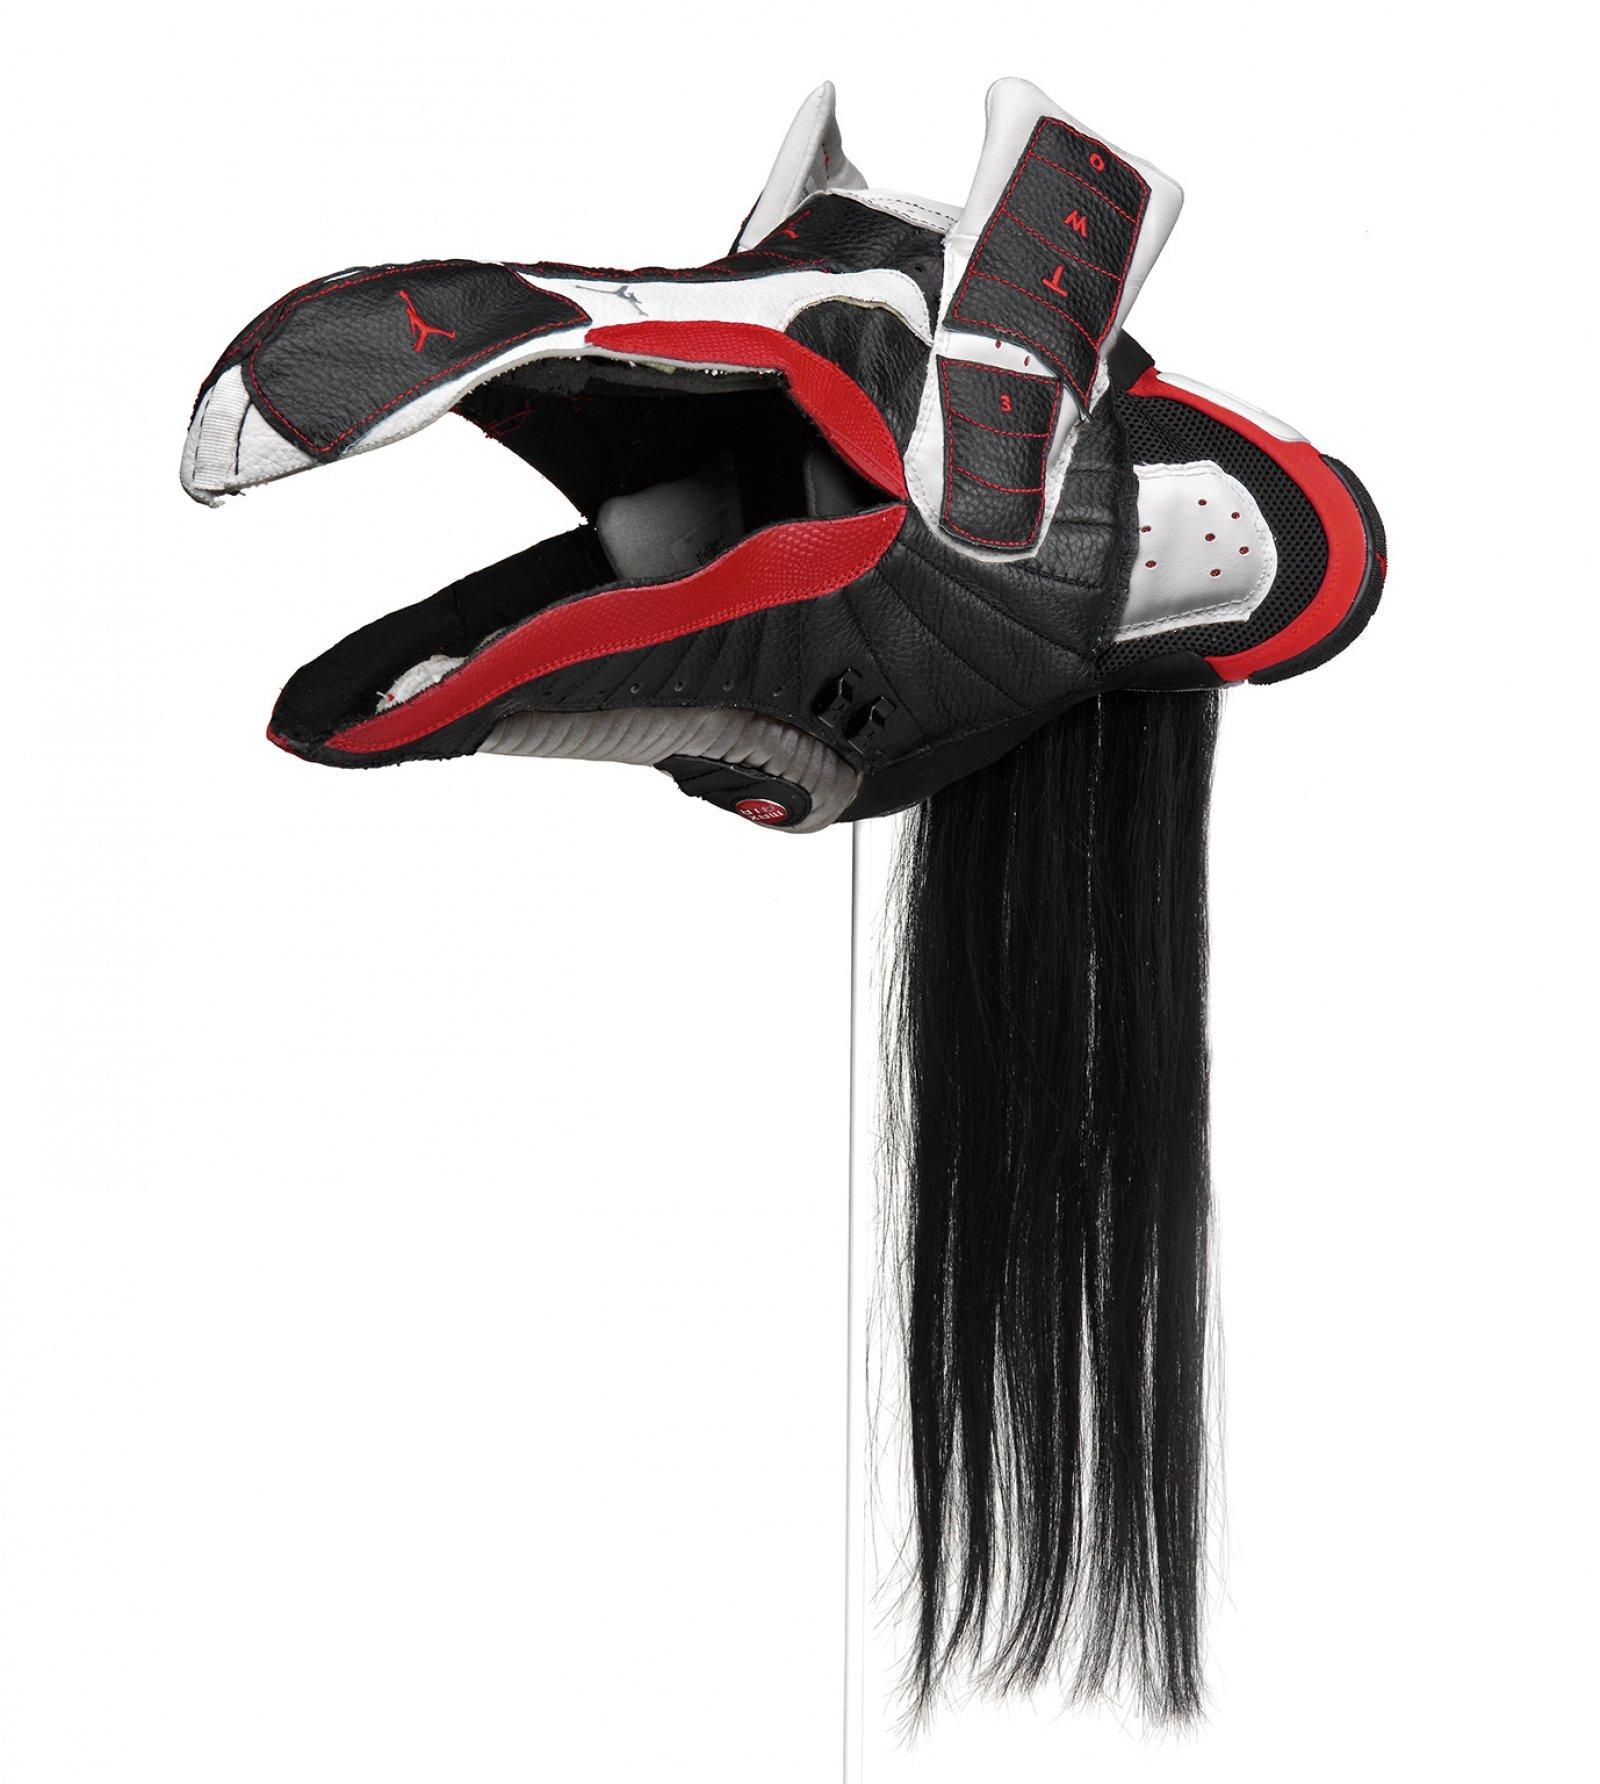 Brian Jungen,Prototype for New Understanding #16, 2004, nike air jordans, human hair, 23 x 12 x 18 in. (57 x 31 x 46 cm)